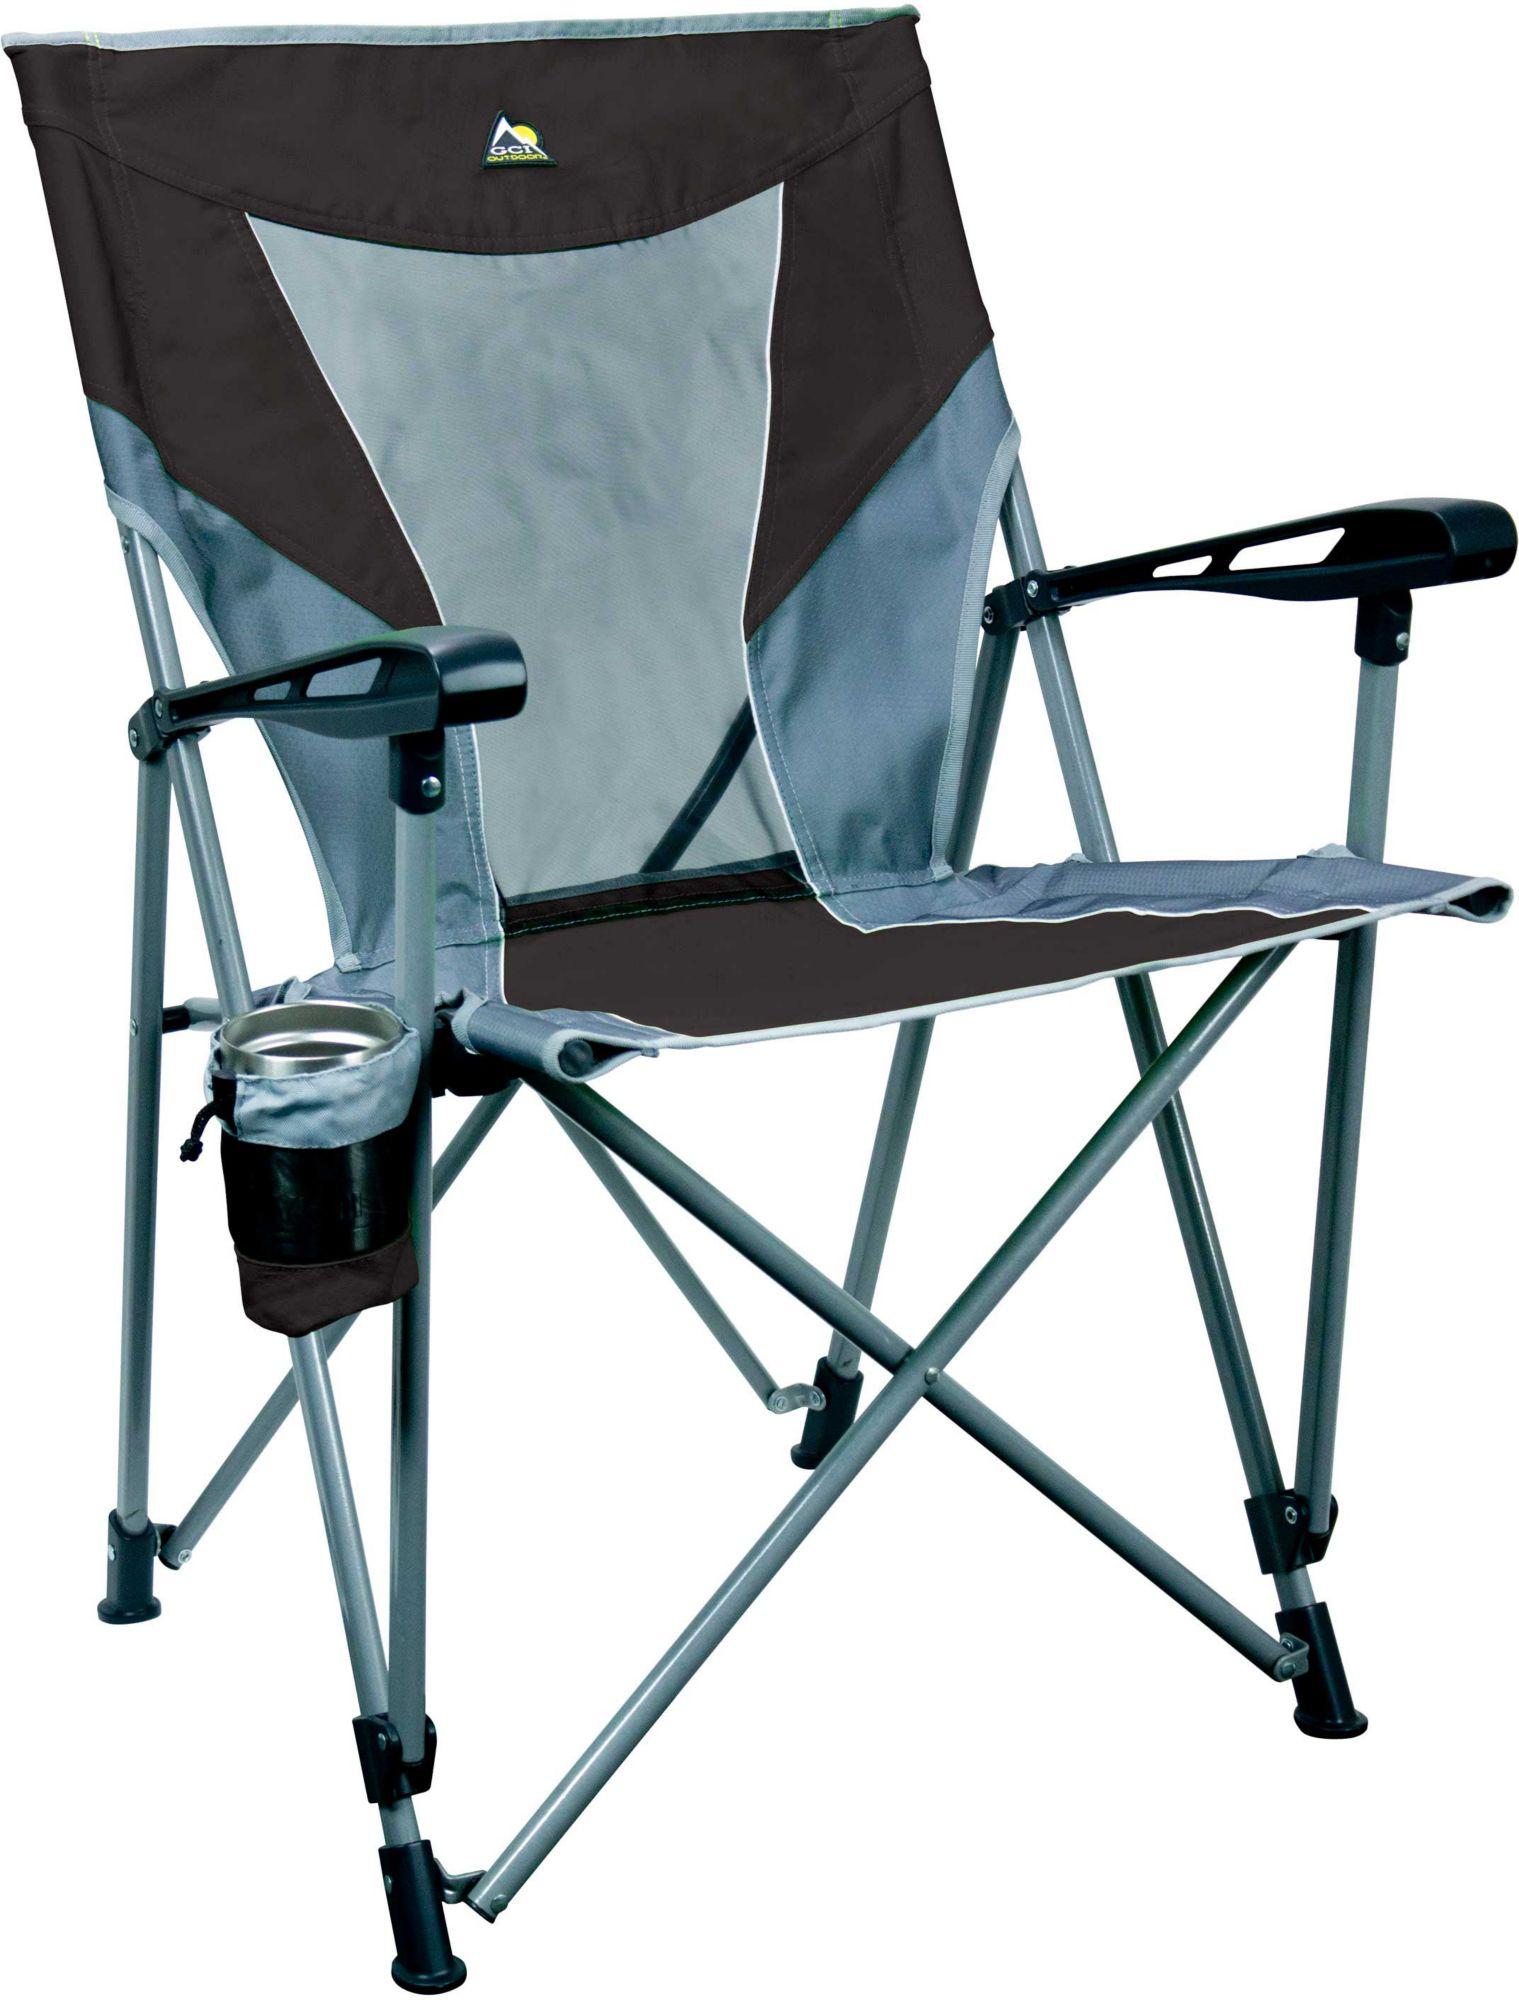 GCI Outdoor Sports Chair  sc 1 st  Field u0026 Stream & GCI Outdoor Sports Chair   Field u0026 Stream